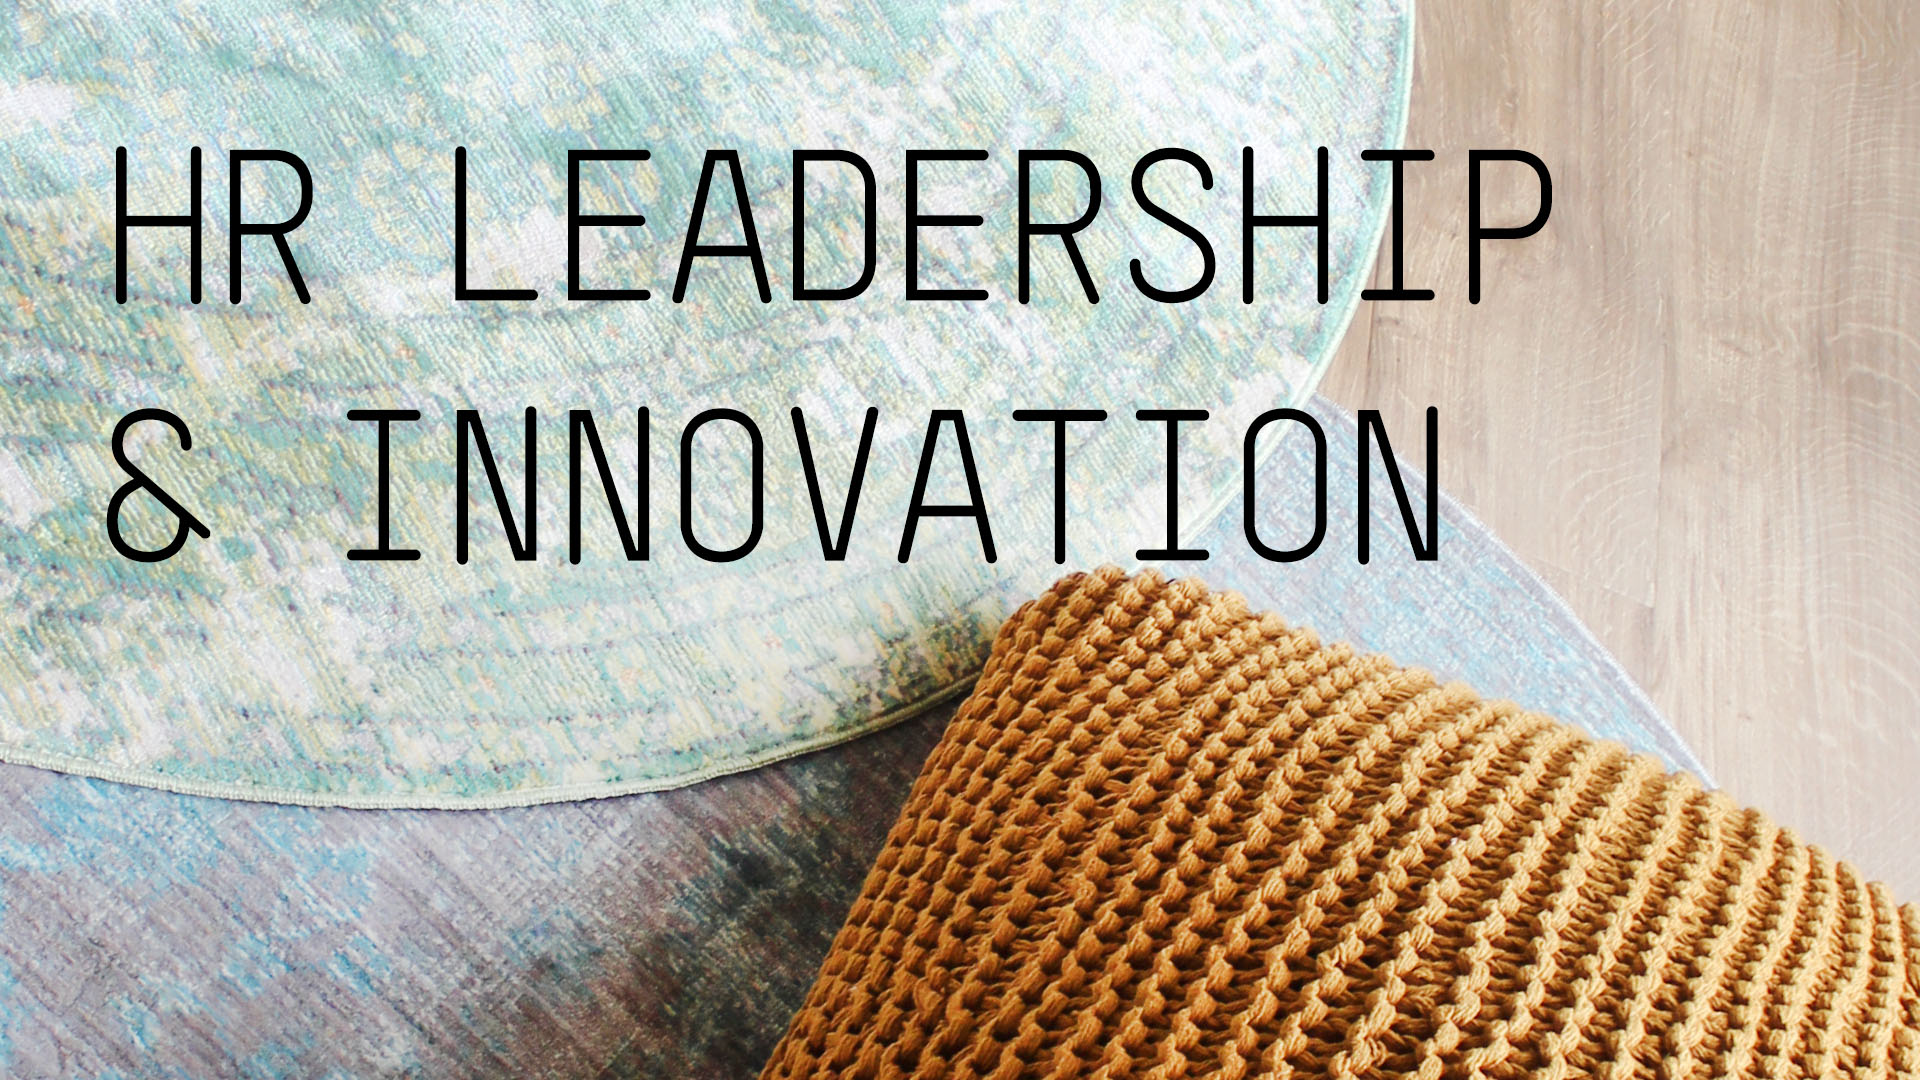 Akka Architects Blog - HR Leadership Innovation